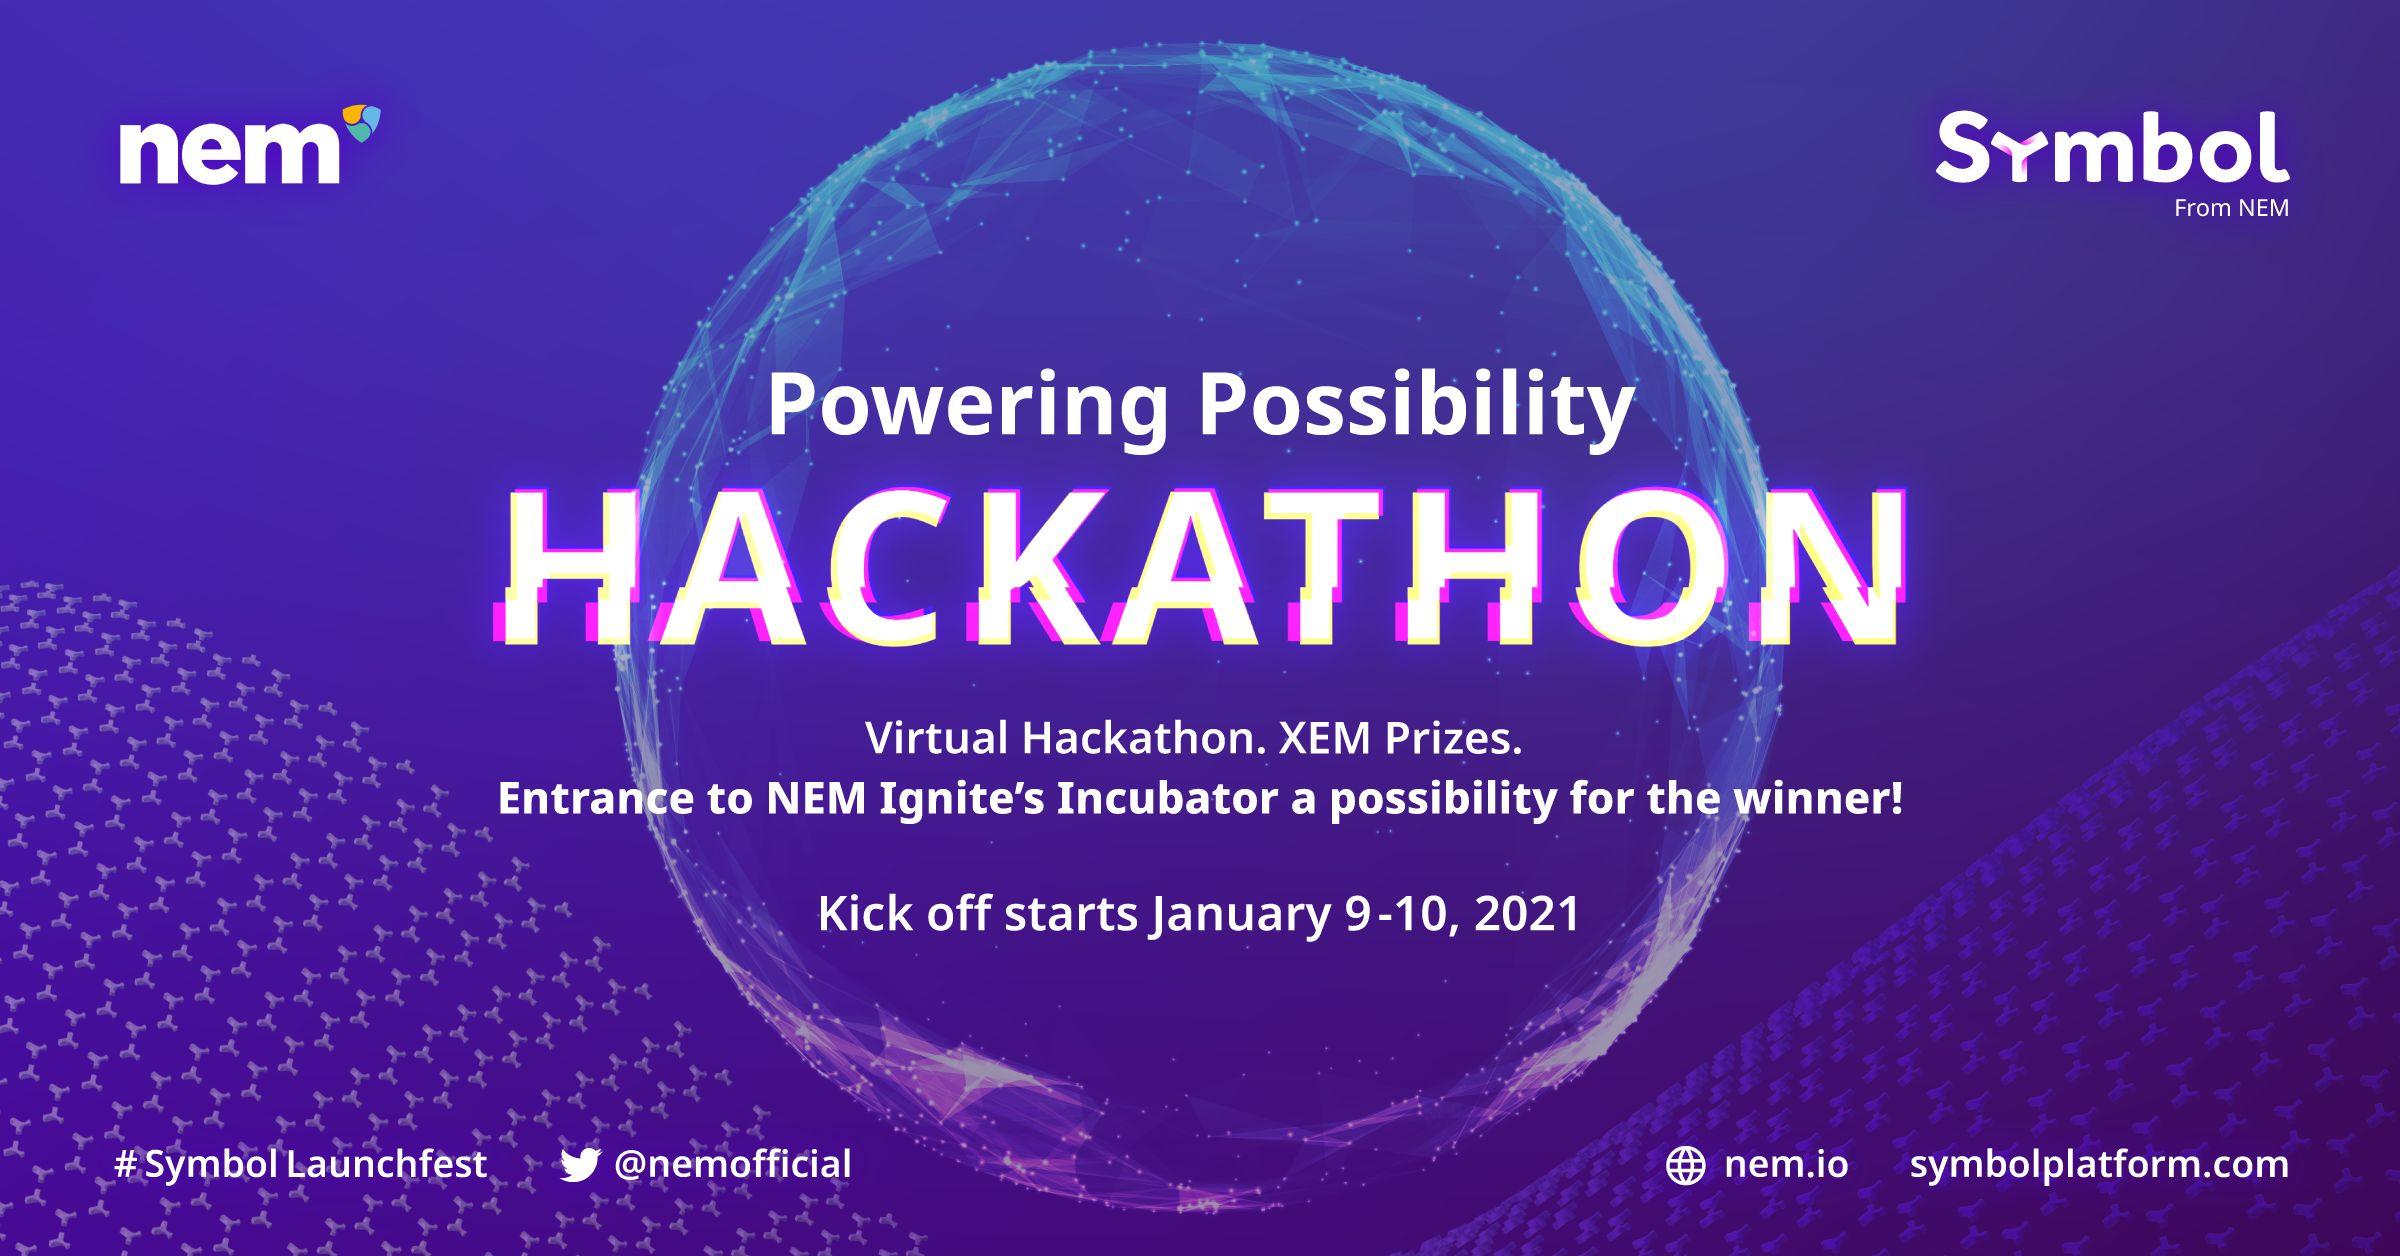 /poweringpossibility-online-hackathon-kicks-off-january-9th-8po31fd feature image